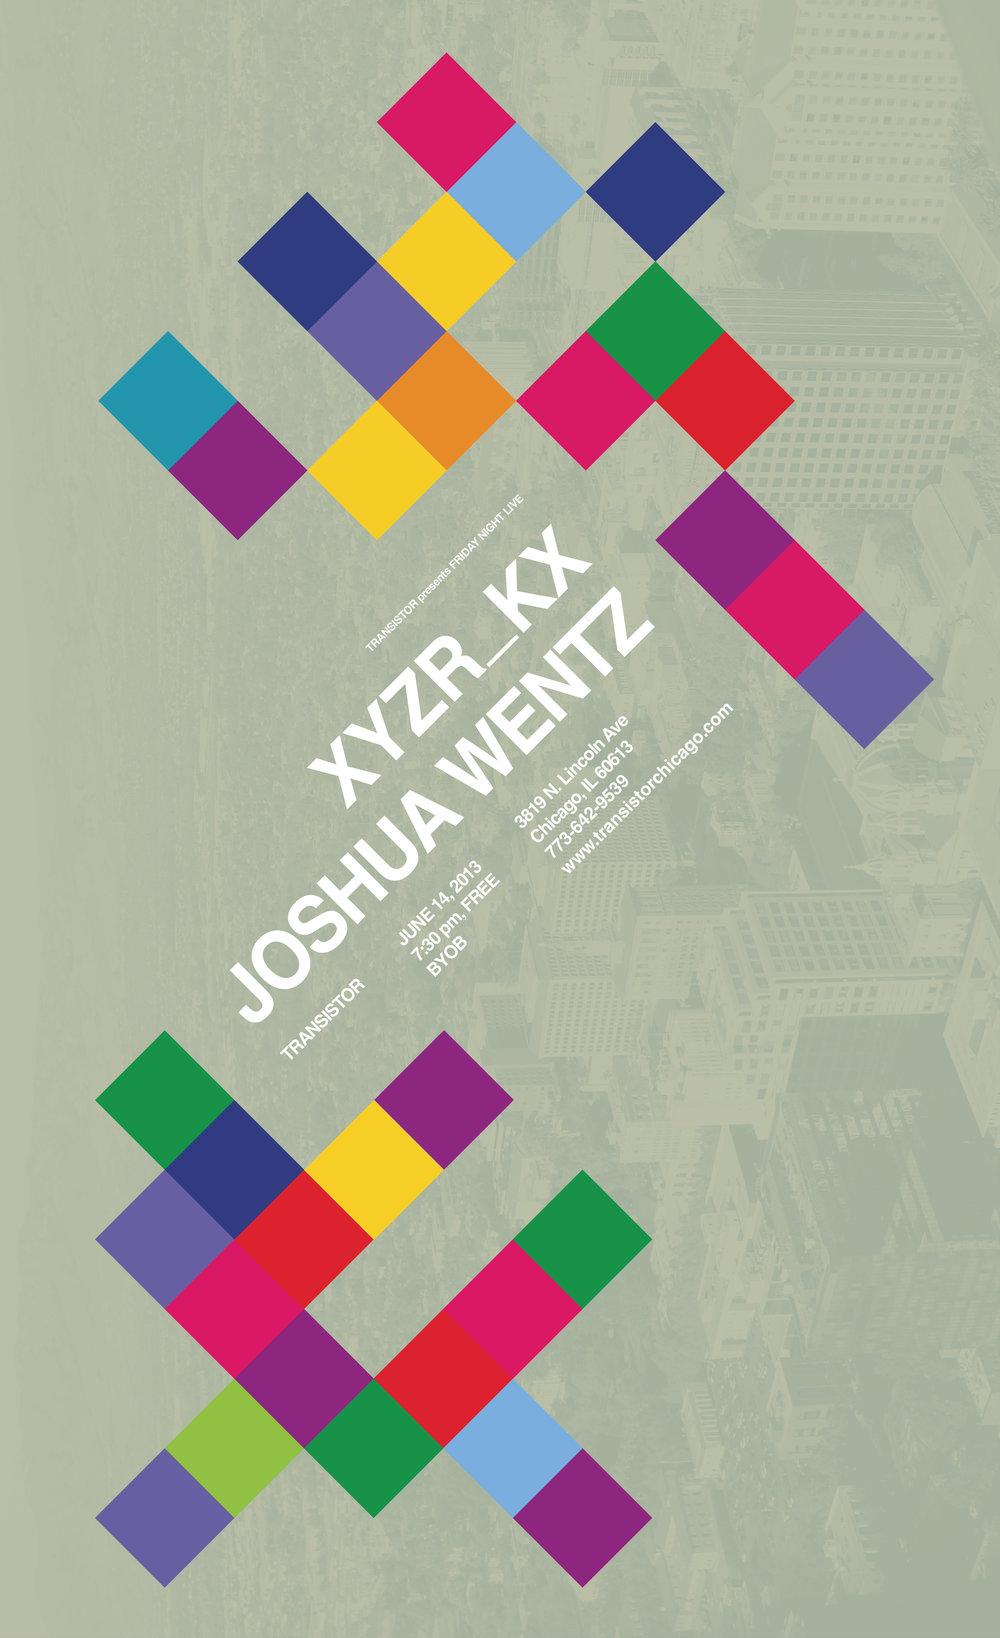 xyzrkx-01-01-01.jpg